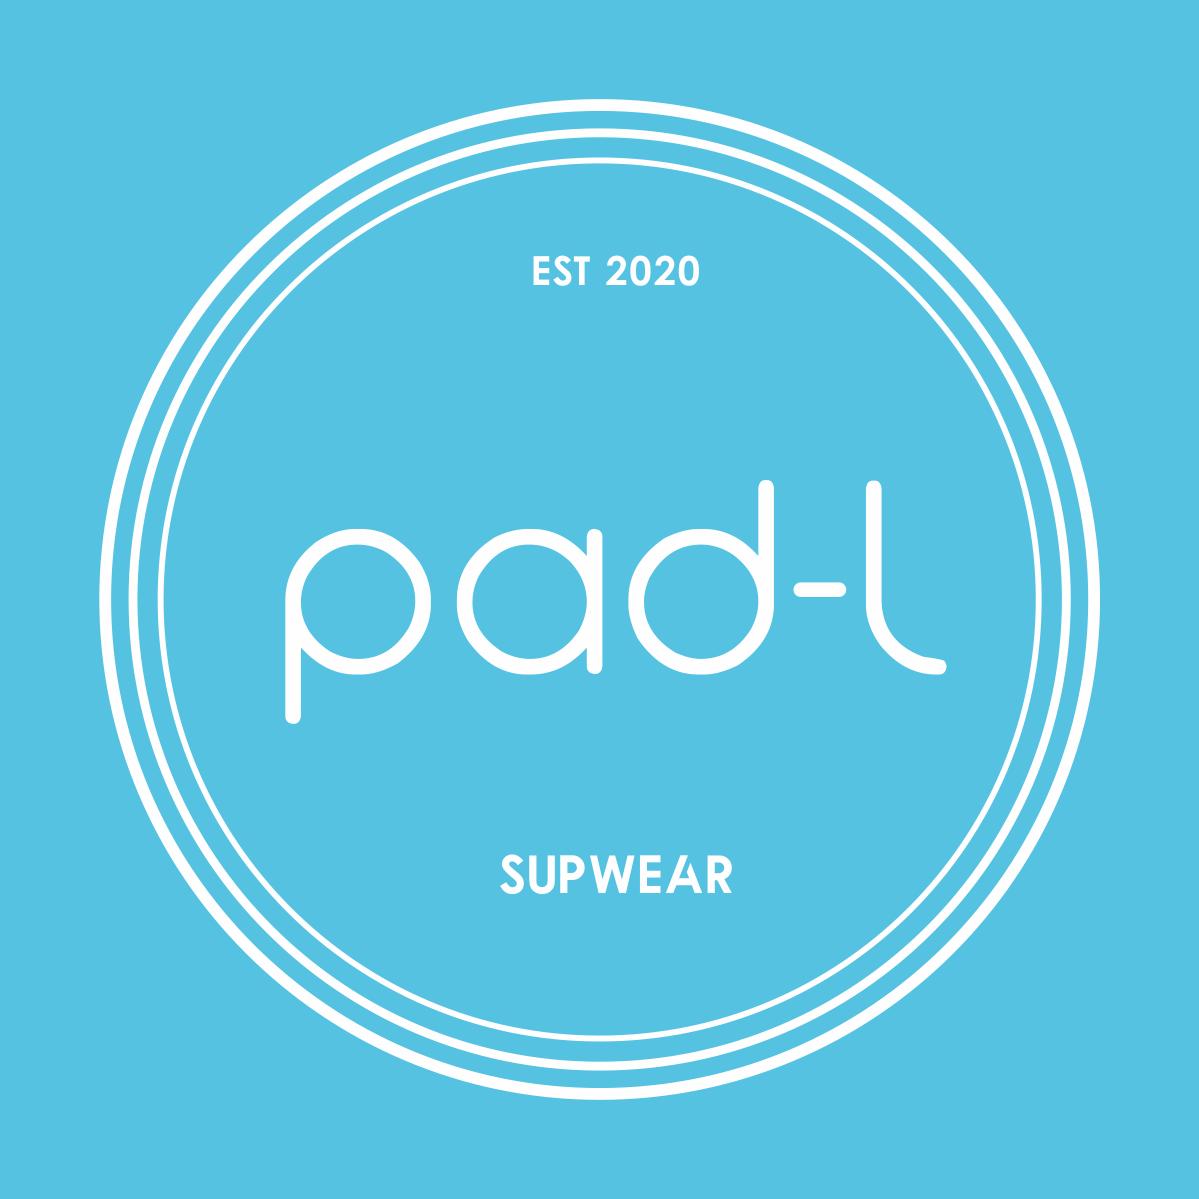 PAD-L UK